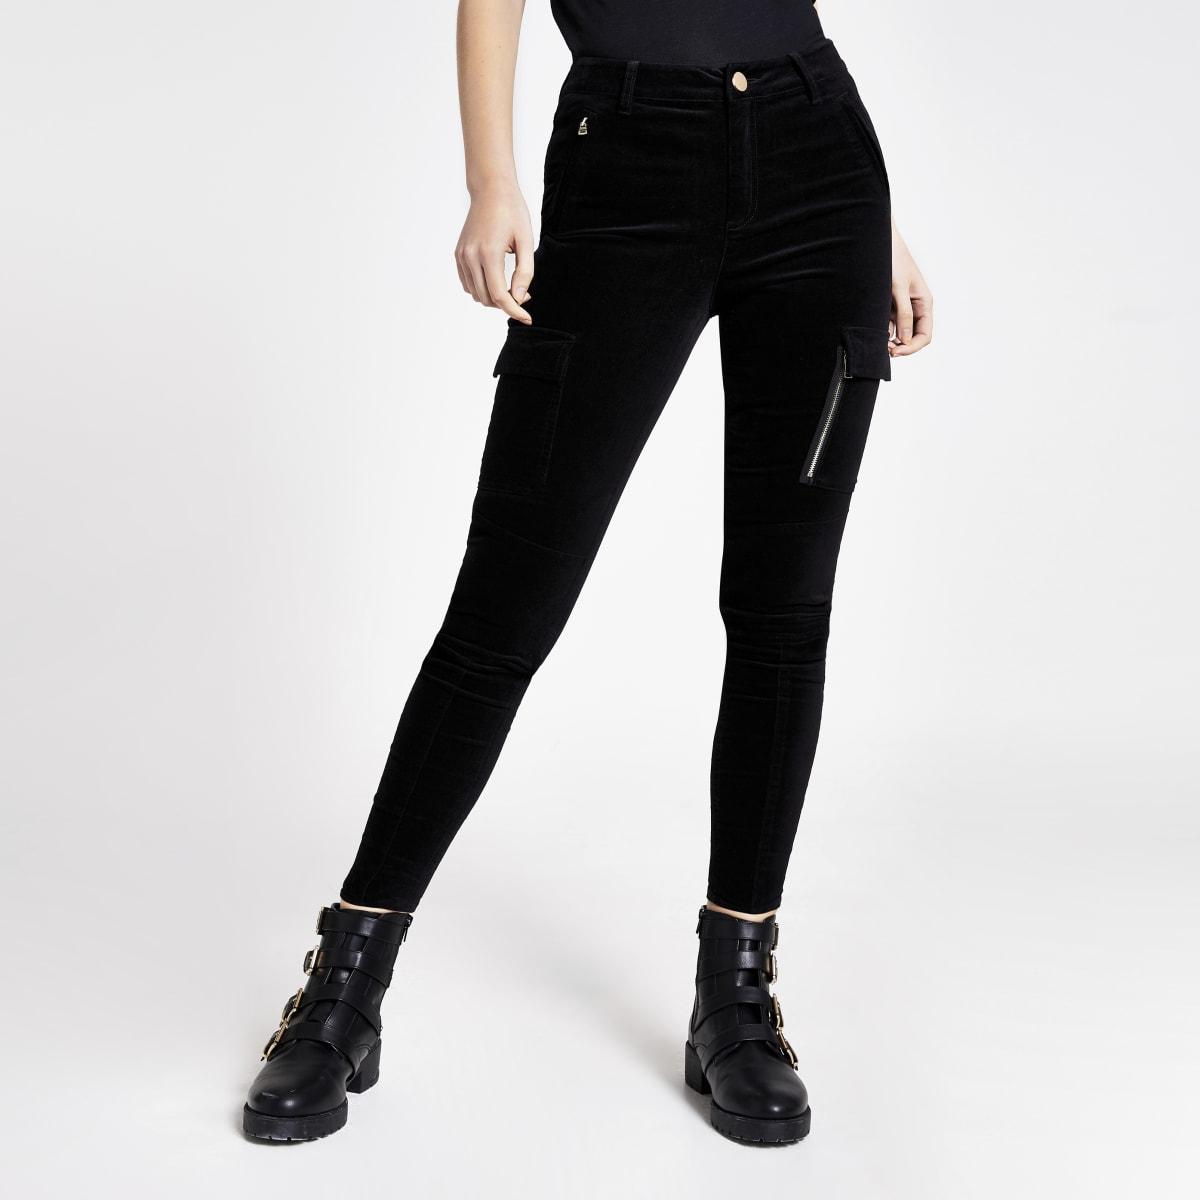 Pantalons utilitaires skinnyen velours noir